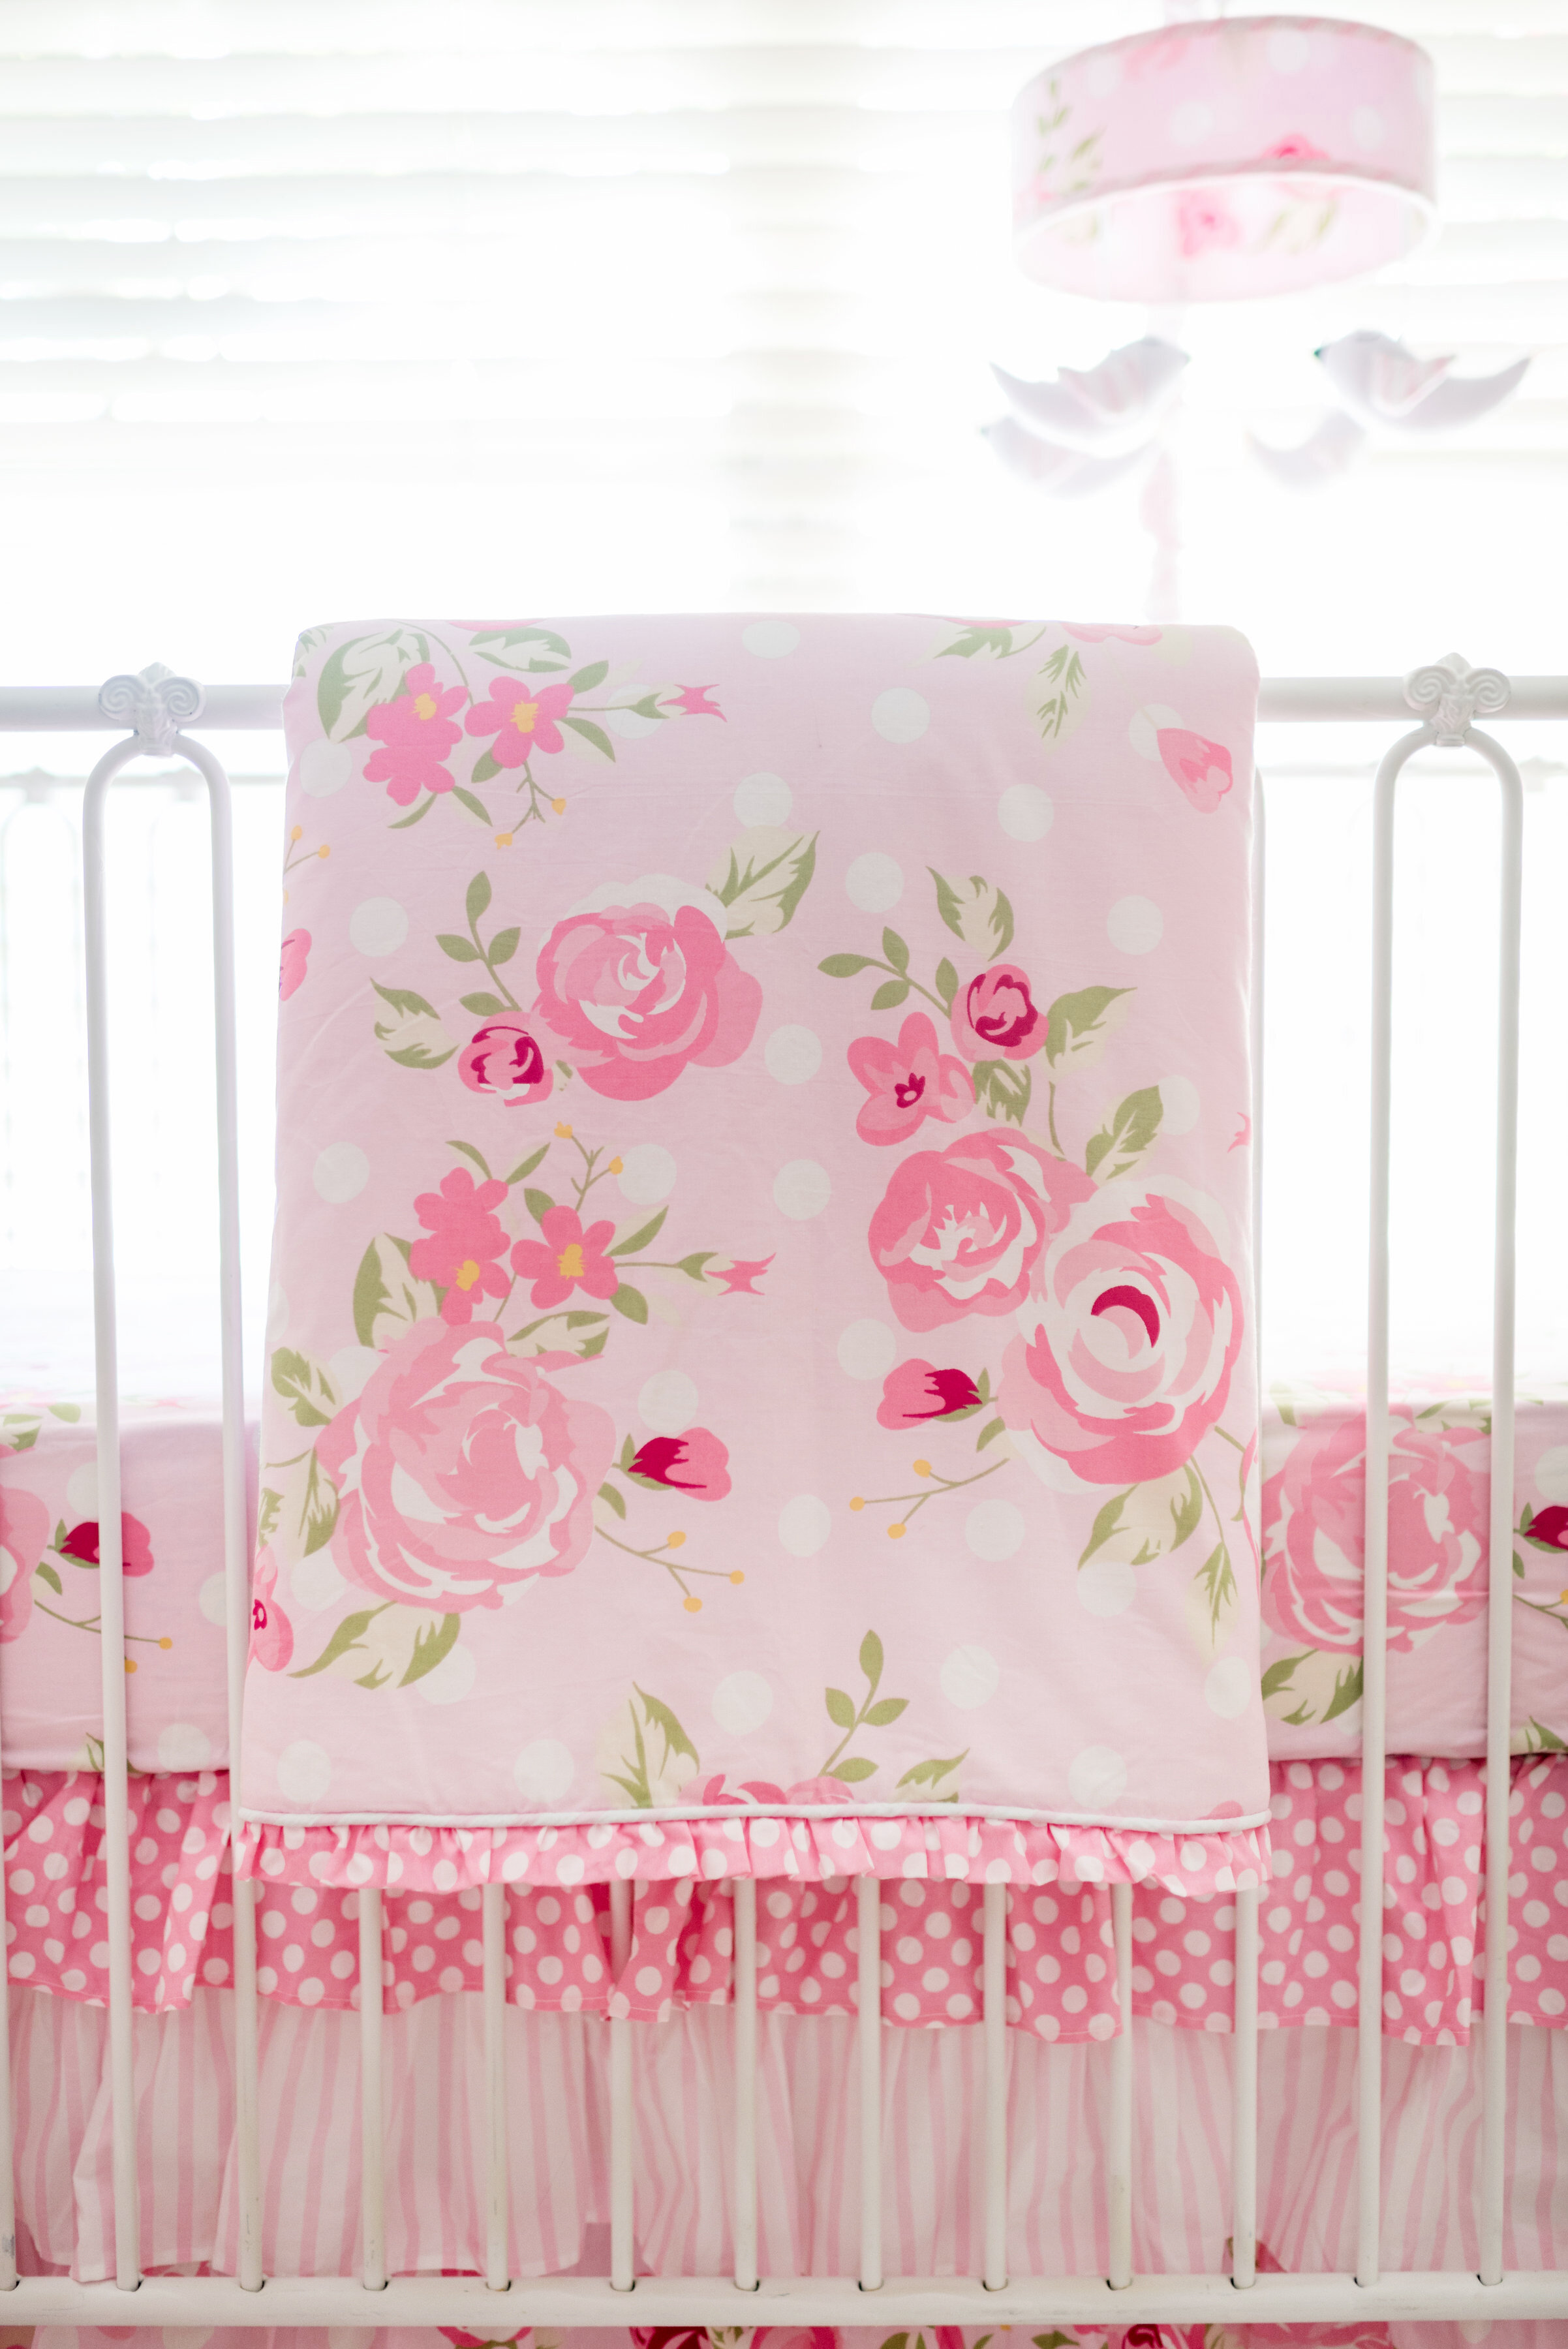 lottie dreams floral crib bedding watercolor purple aqua img set bumperless baby product da cribs ocean